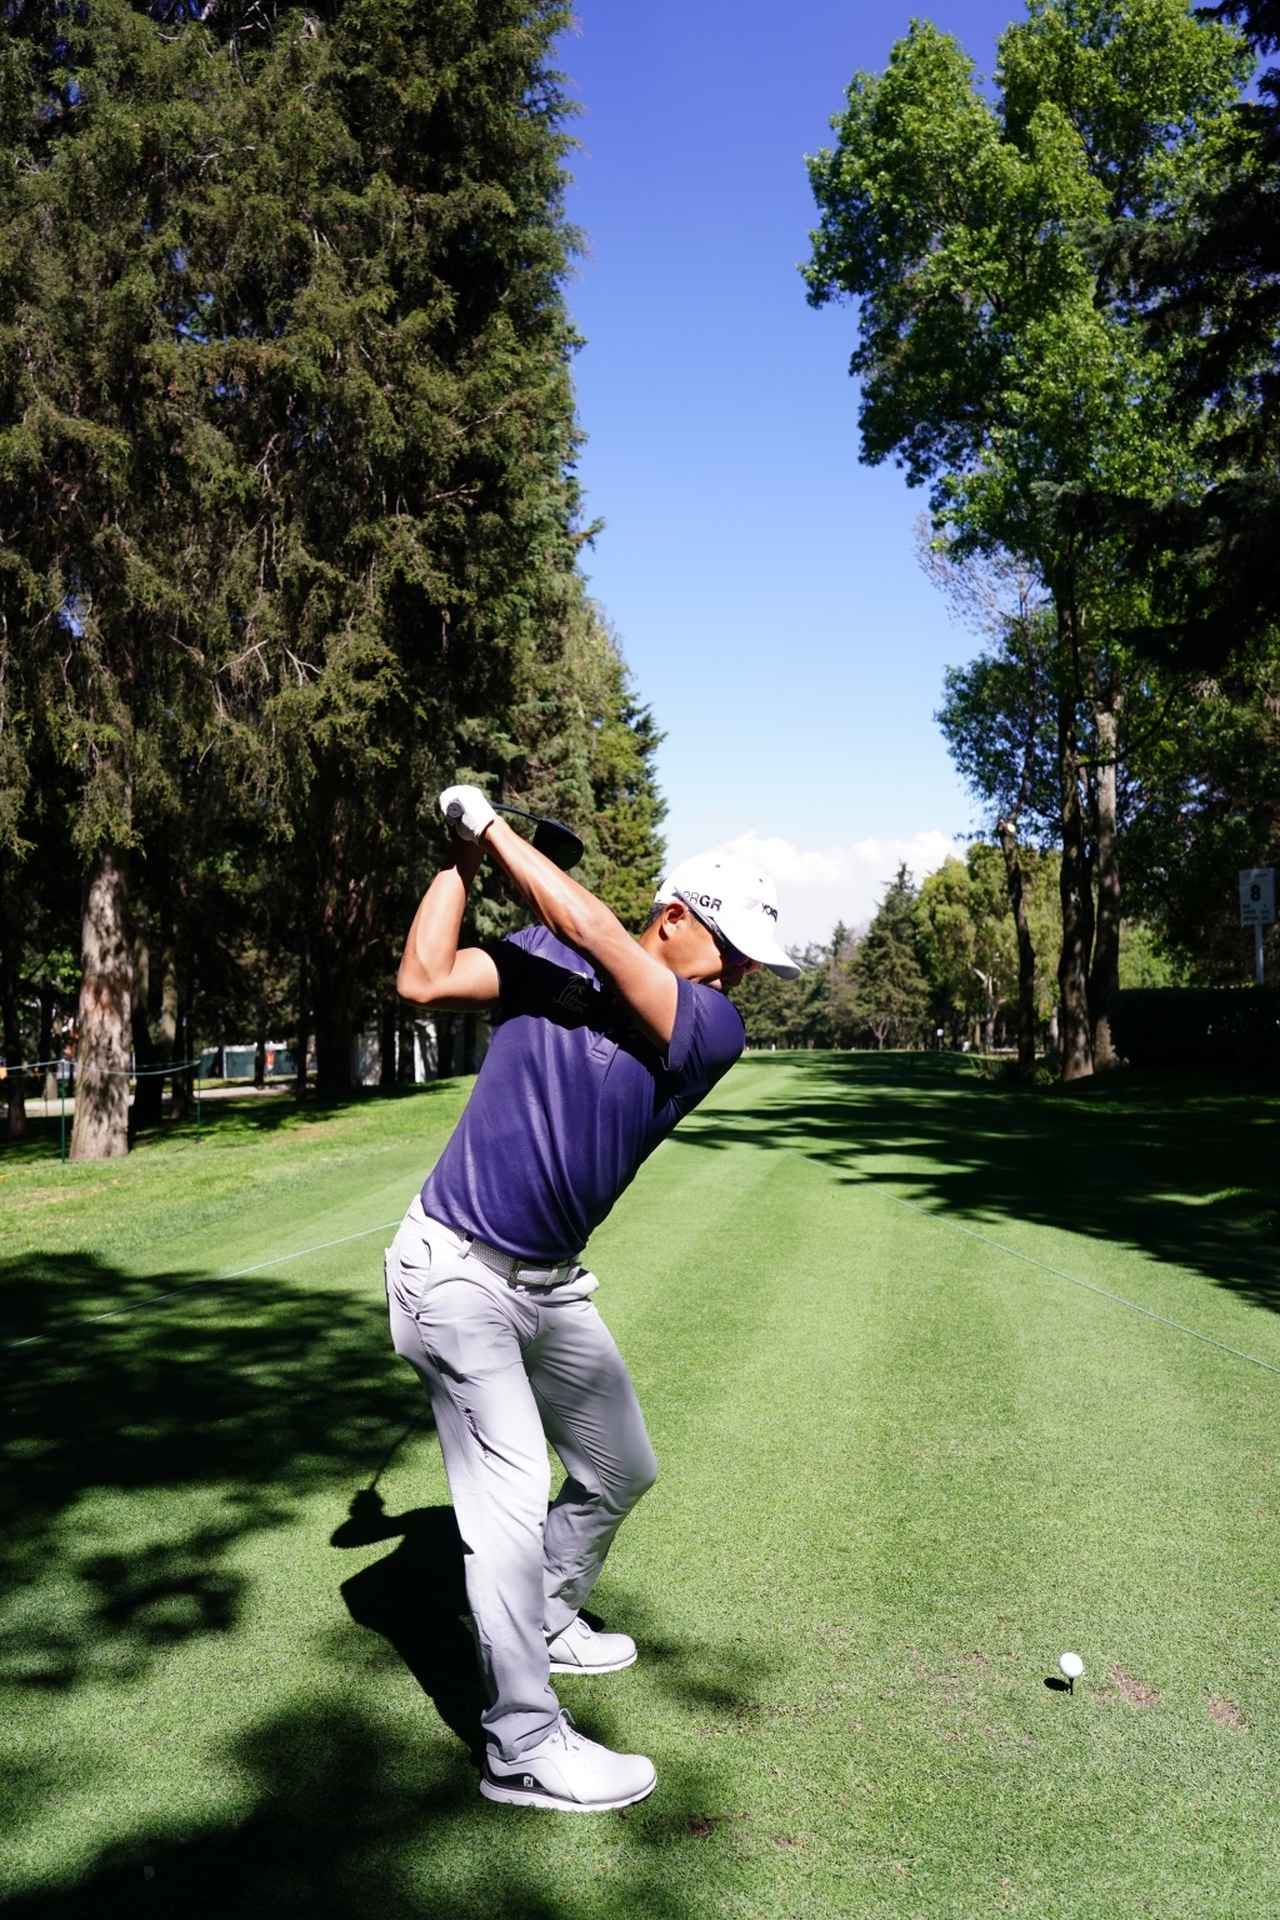 Images : 5番目の画像 - 小平智のドライバー連続写真 - みんなのゴルフダイジェスト